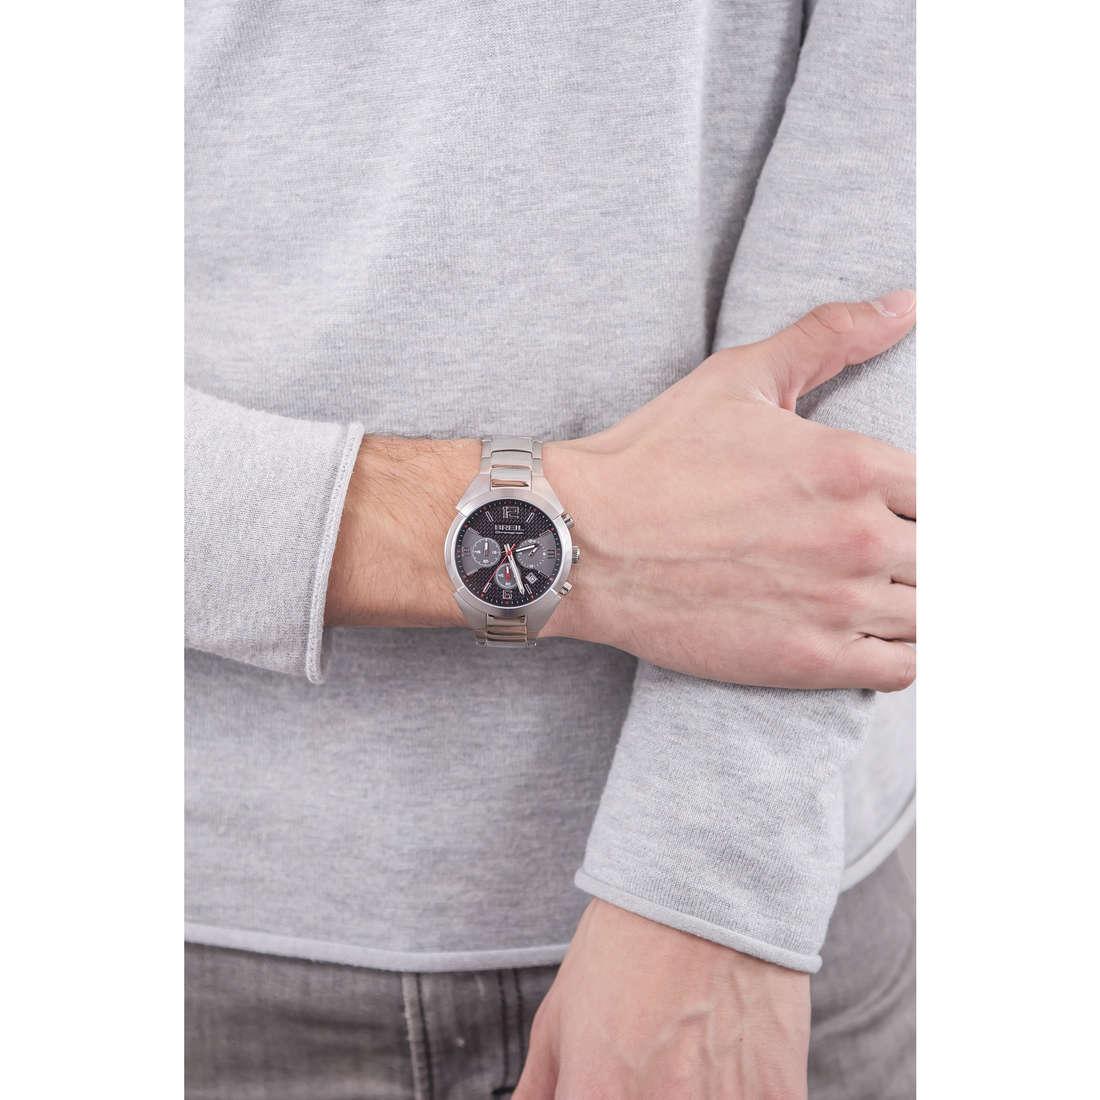 Breil cronografi Gap uomo TW1275 indosso